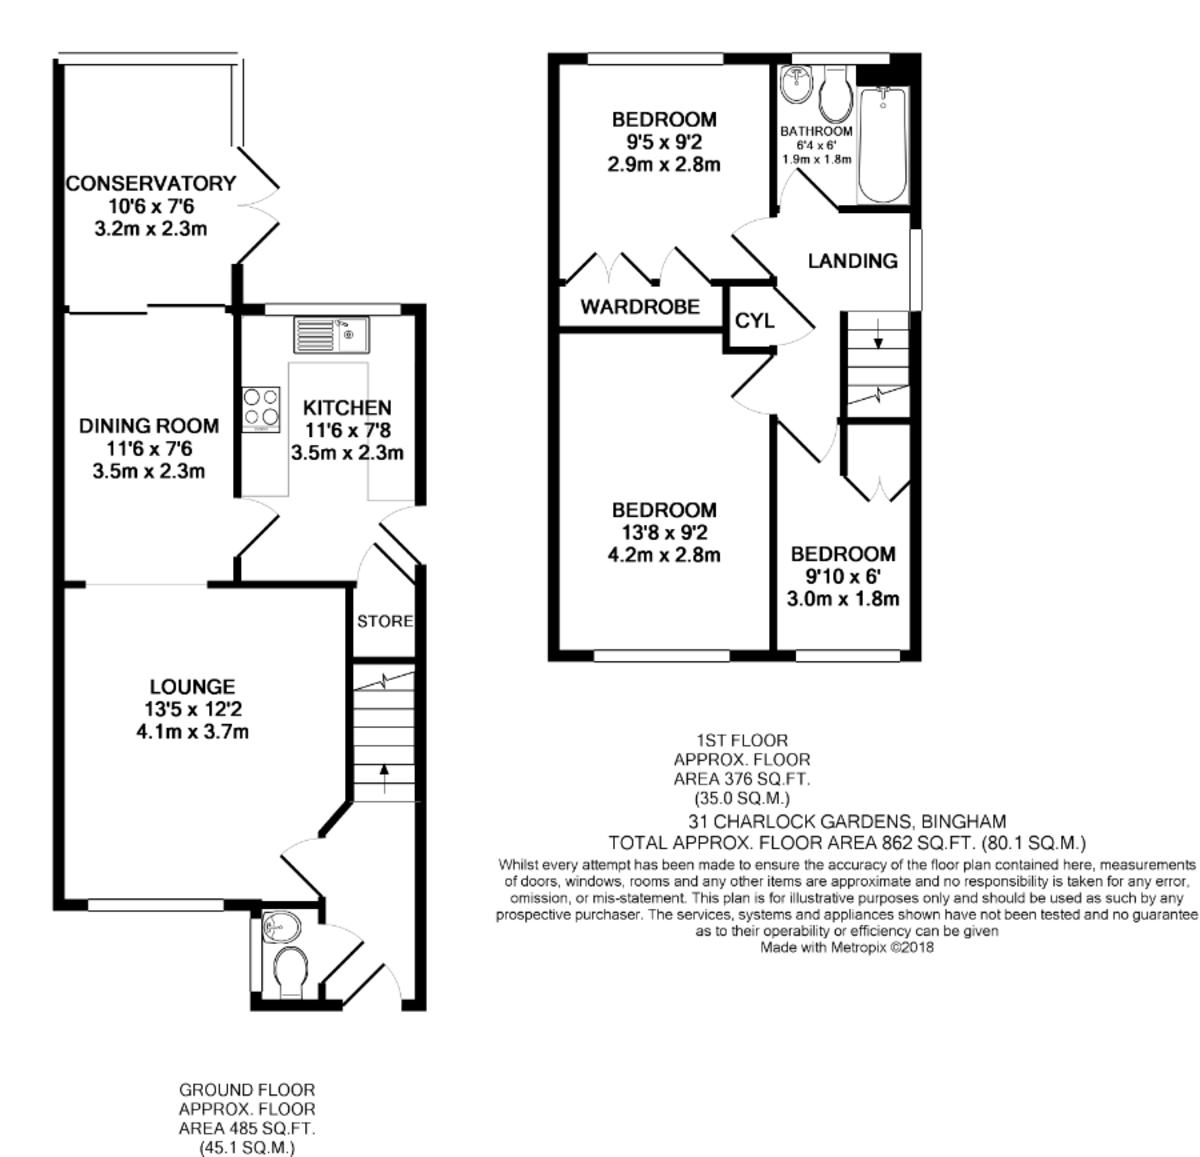 Charlock Gardens, Bingham, NG13 8UH  Floorplan